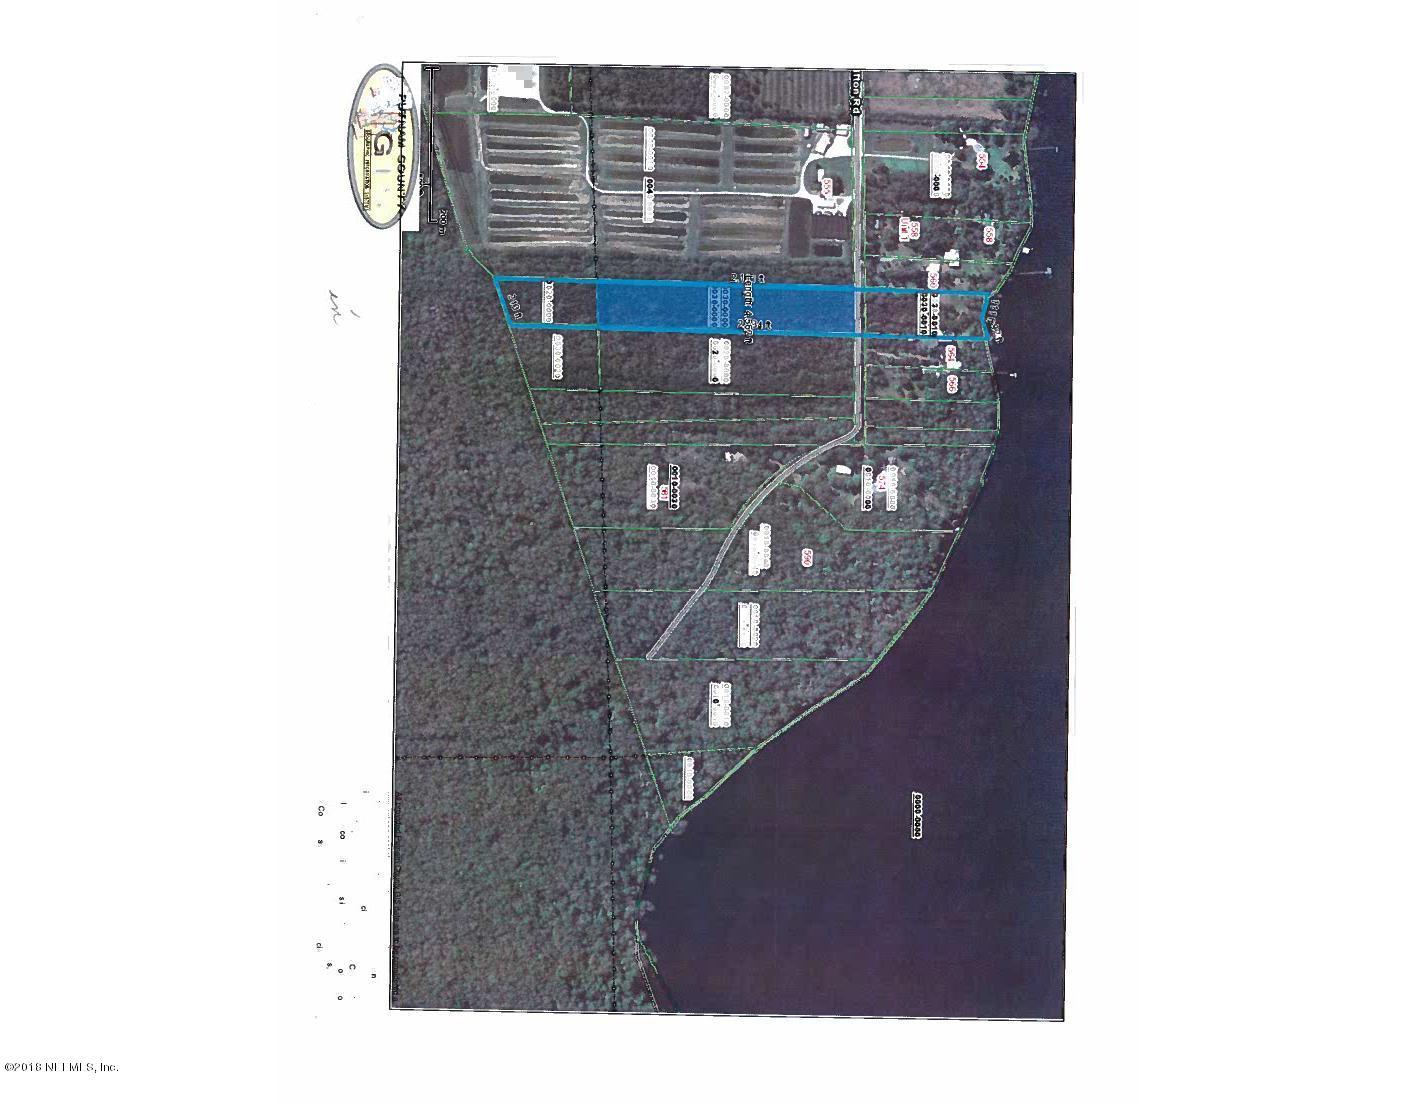 562 CLIFTON, CRESCENT CITY, FLORIDA 32112, ,Vacant land,For sale,CLIFTON,954084